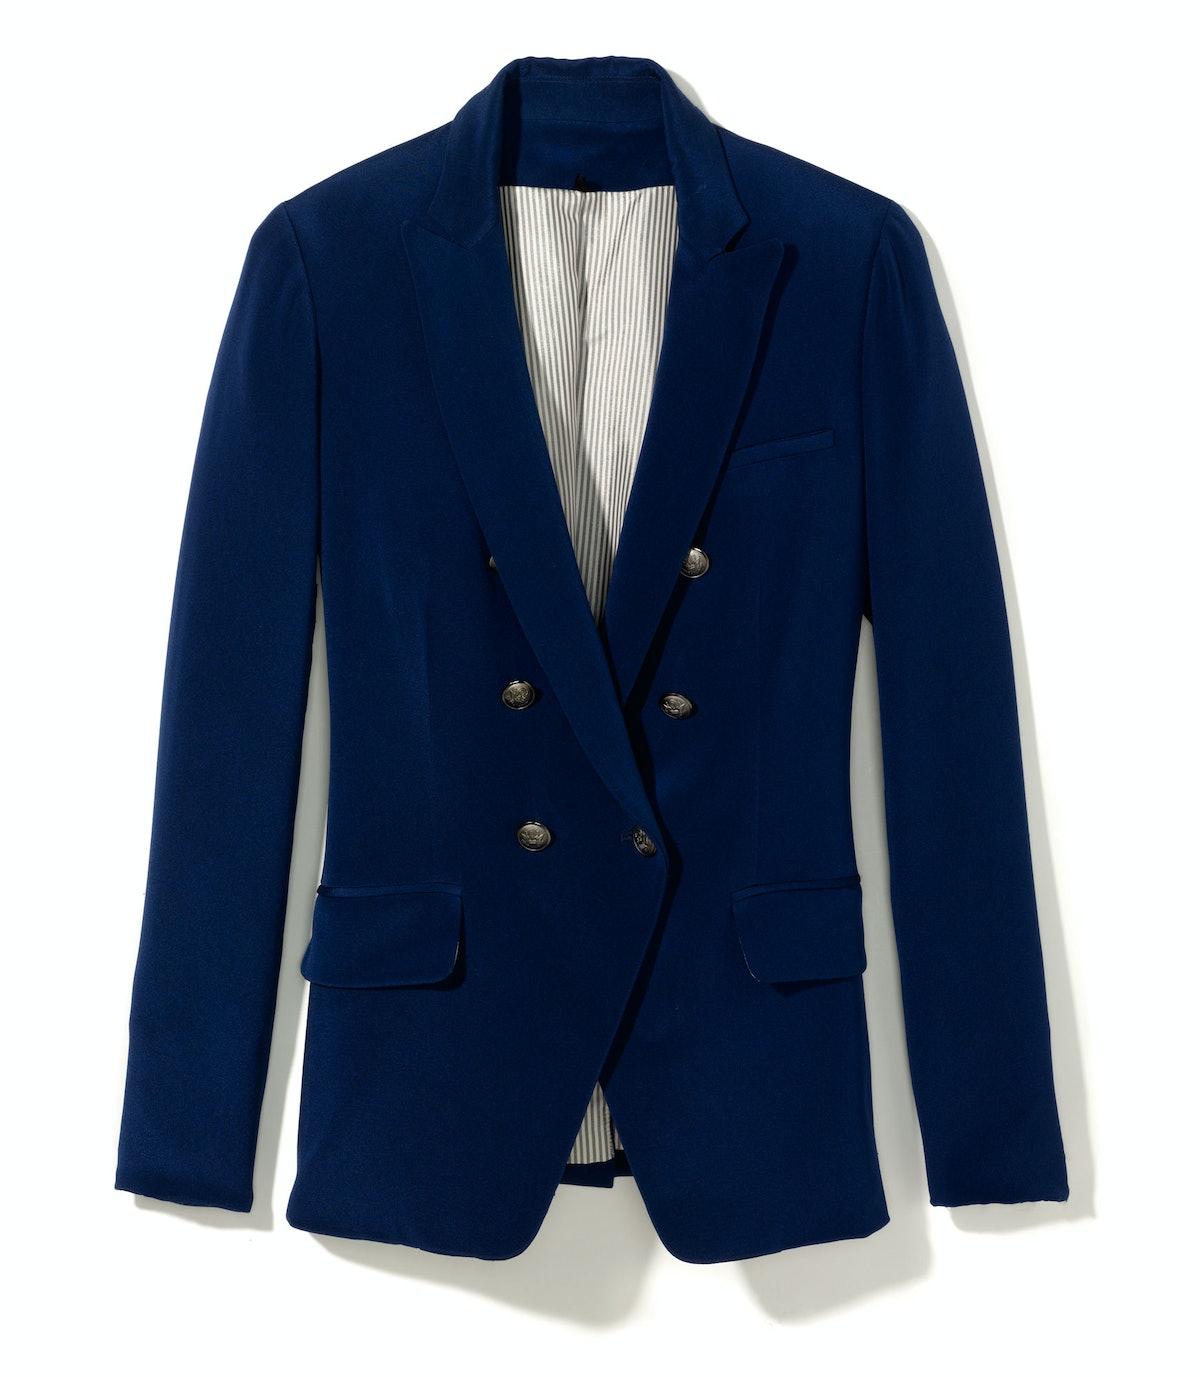 Veronica Beard jacket, $895, [shopbop.com](http://rstyle.me/n/dssxh3w3n).